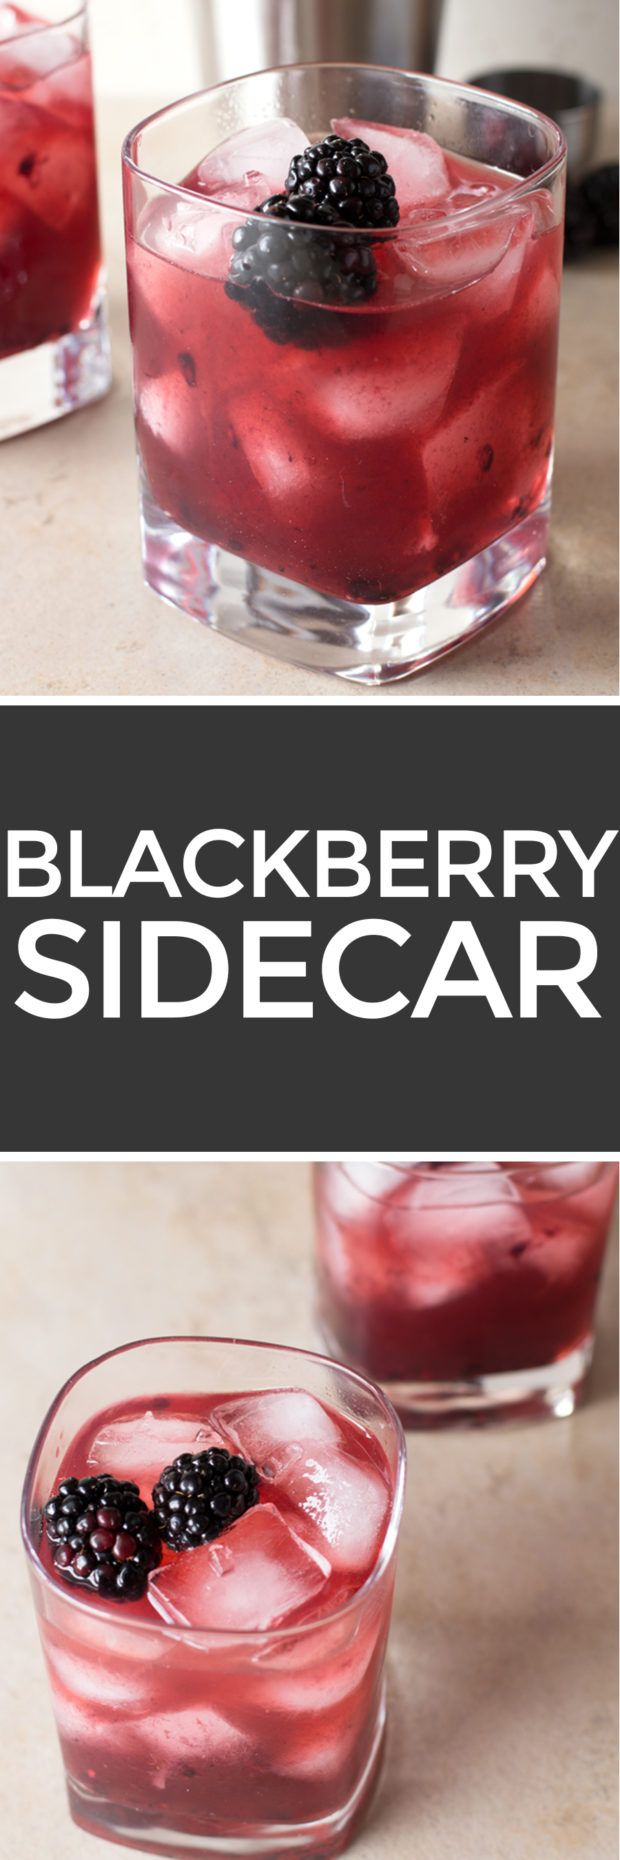 Blackberry Sidecar – Cake 'n Knife